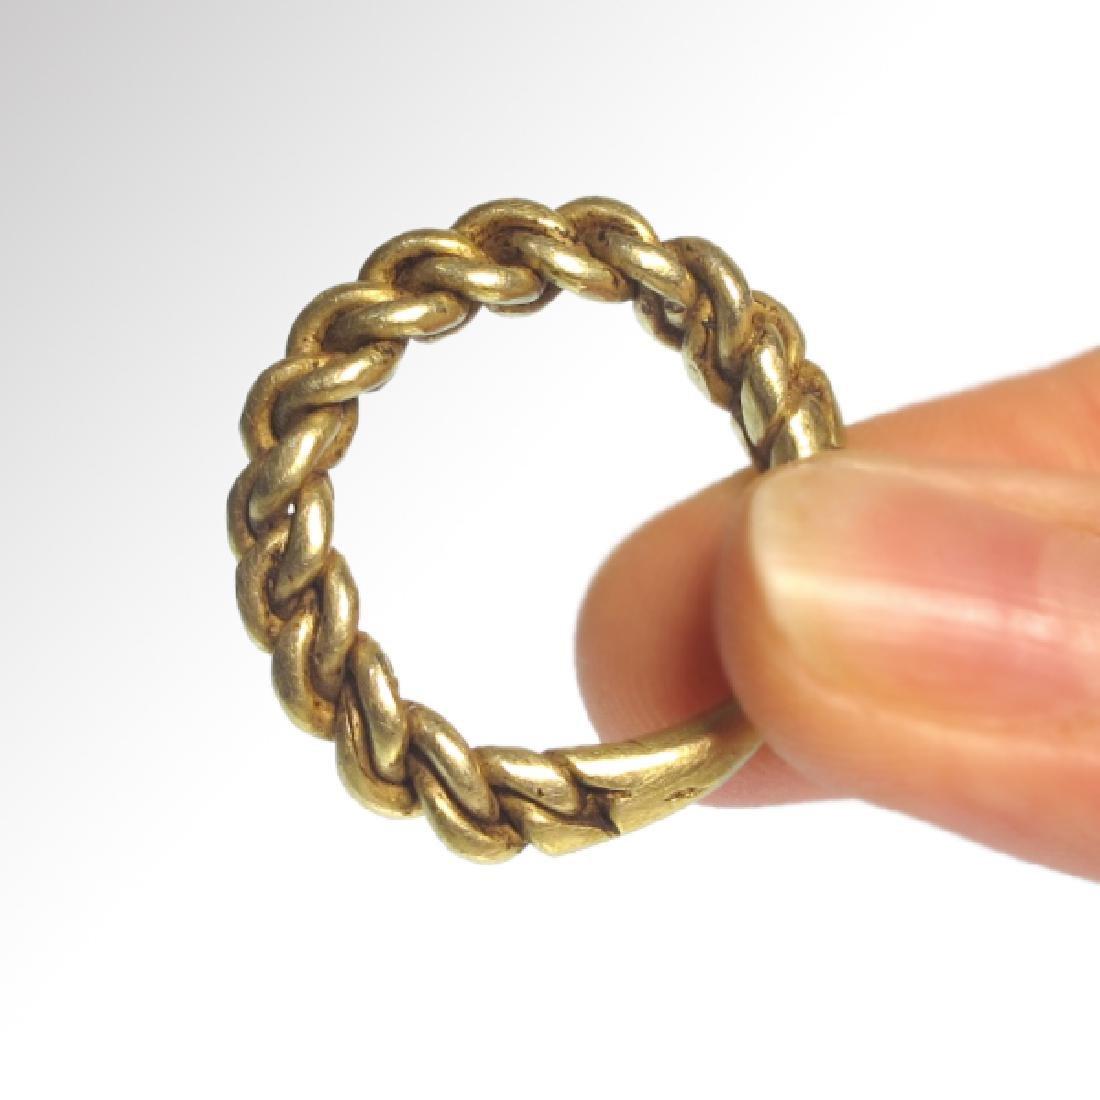 Viking Gold Ring, c. 10th Century A.D. - 2